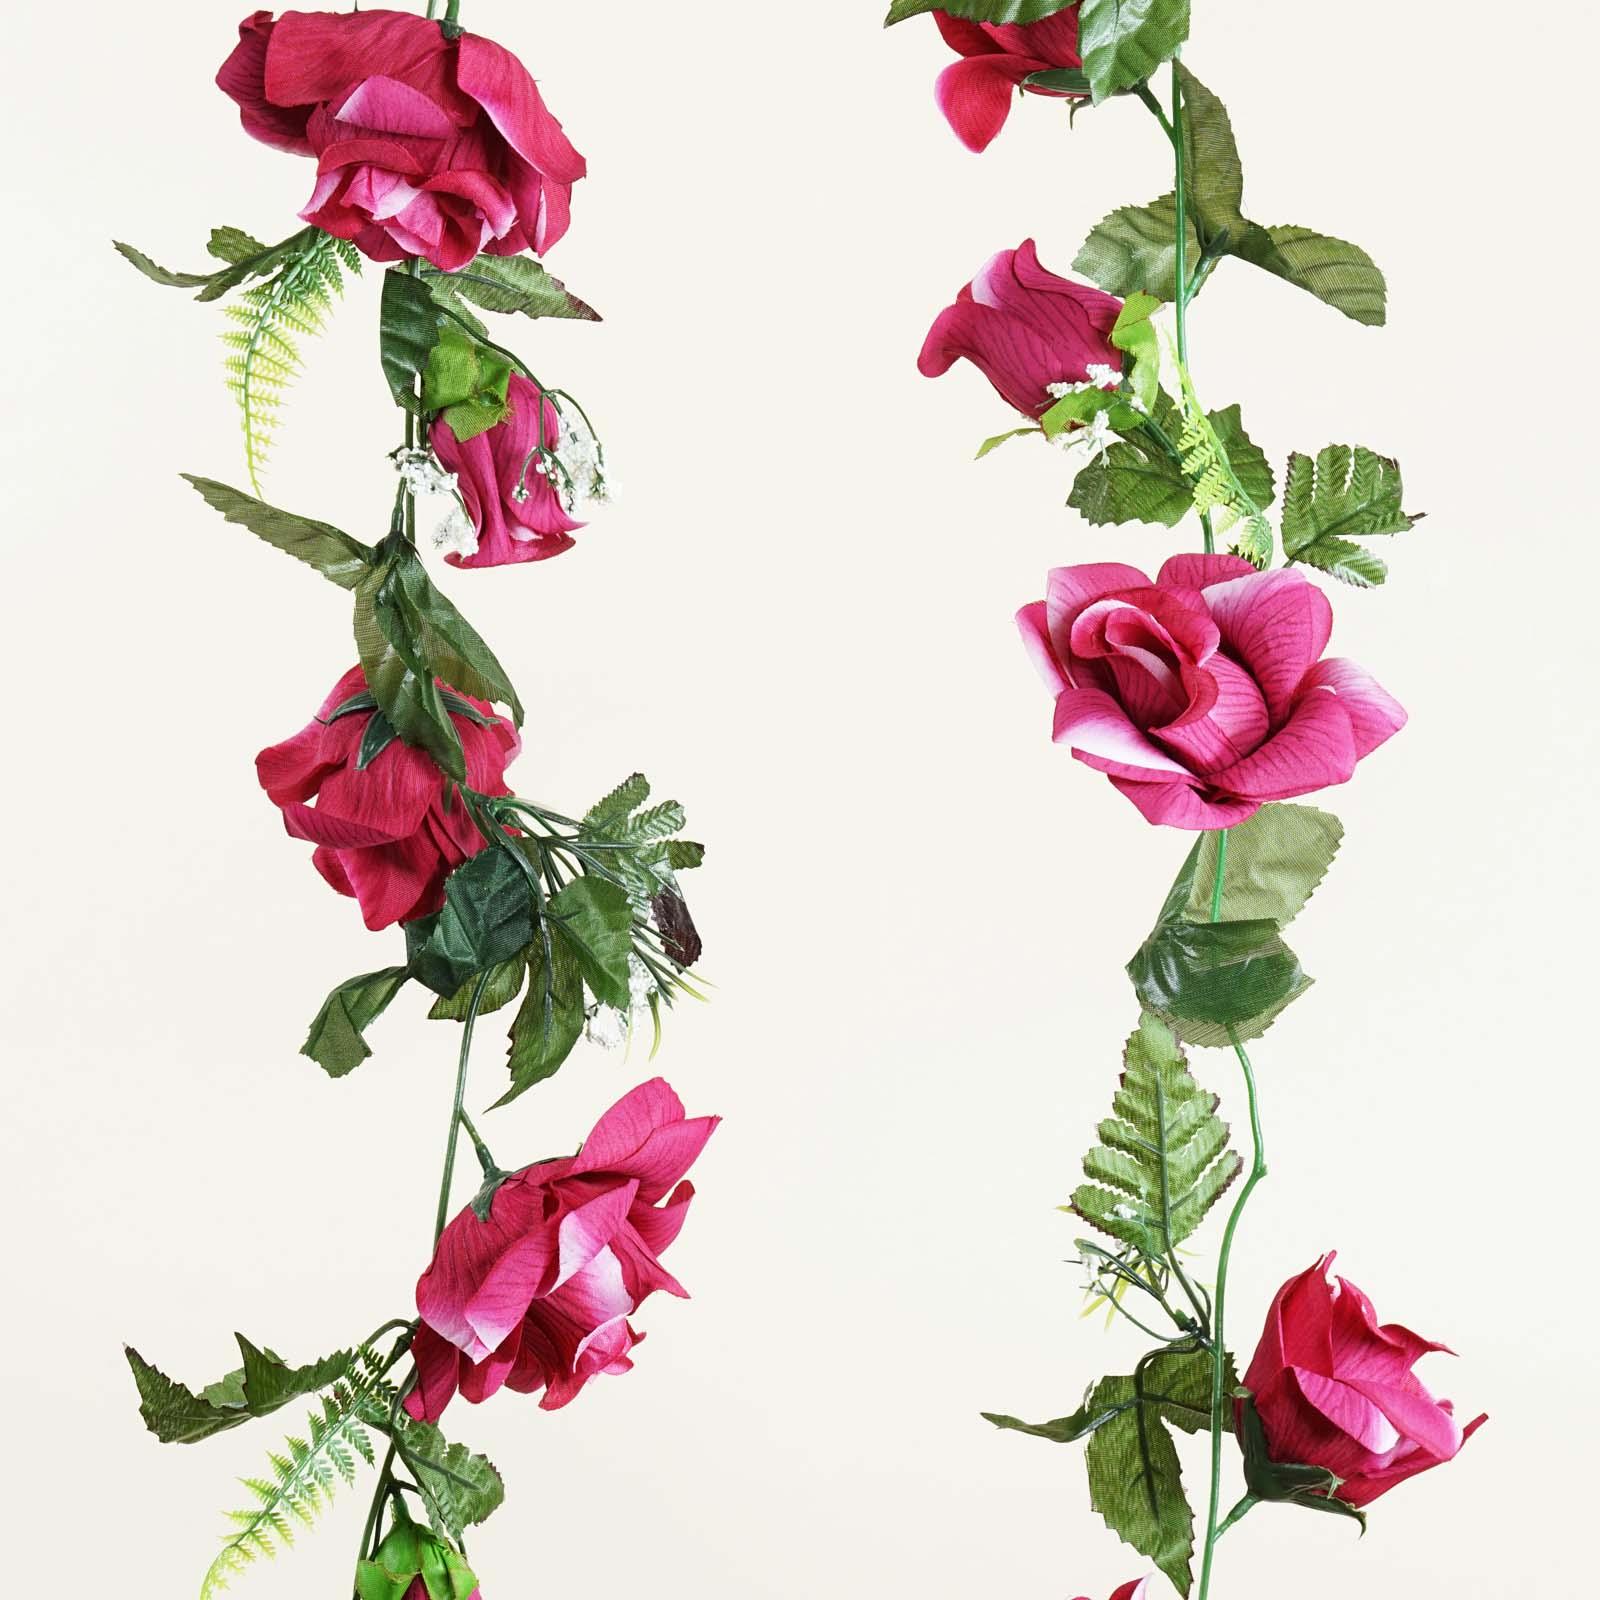 Efavormart 24 ft Large Artificial Rose Garlands for DIY Wedding Centerpieces Arrangements Party Home Decorations Wholesale Supplies